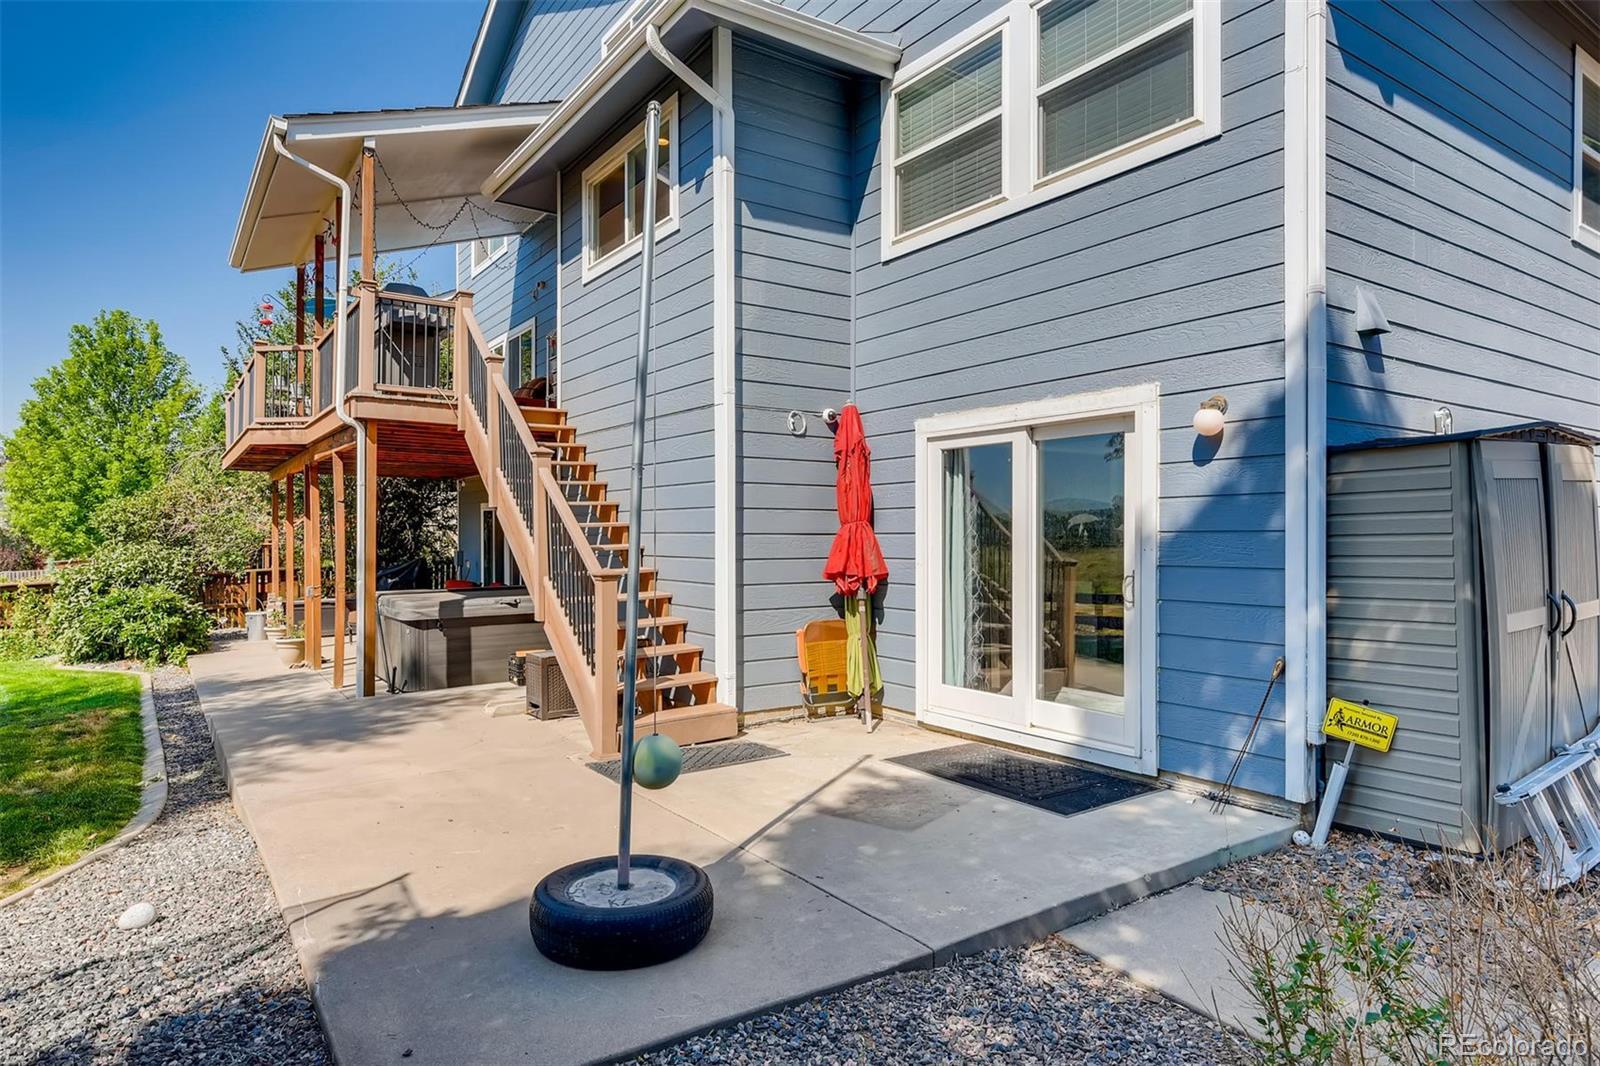 MLS# 2832026 - 32 - 1594 Arrowhead Road, Highlands Ranch, CO 80126